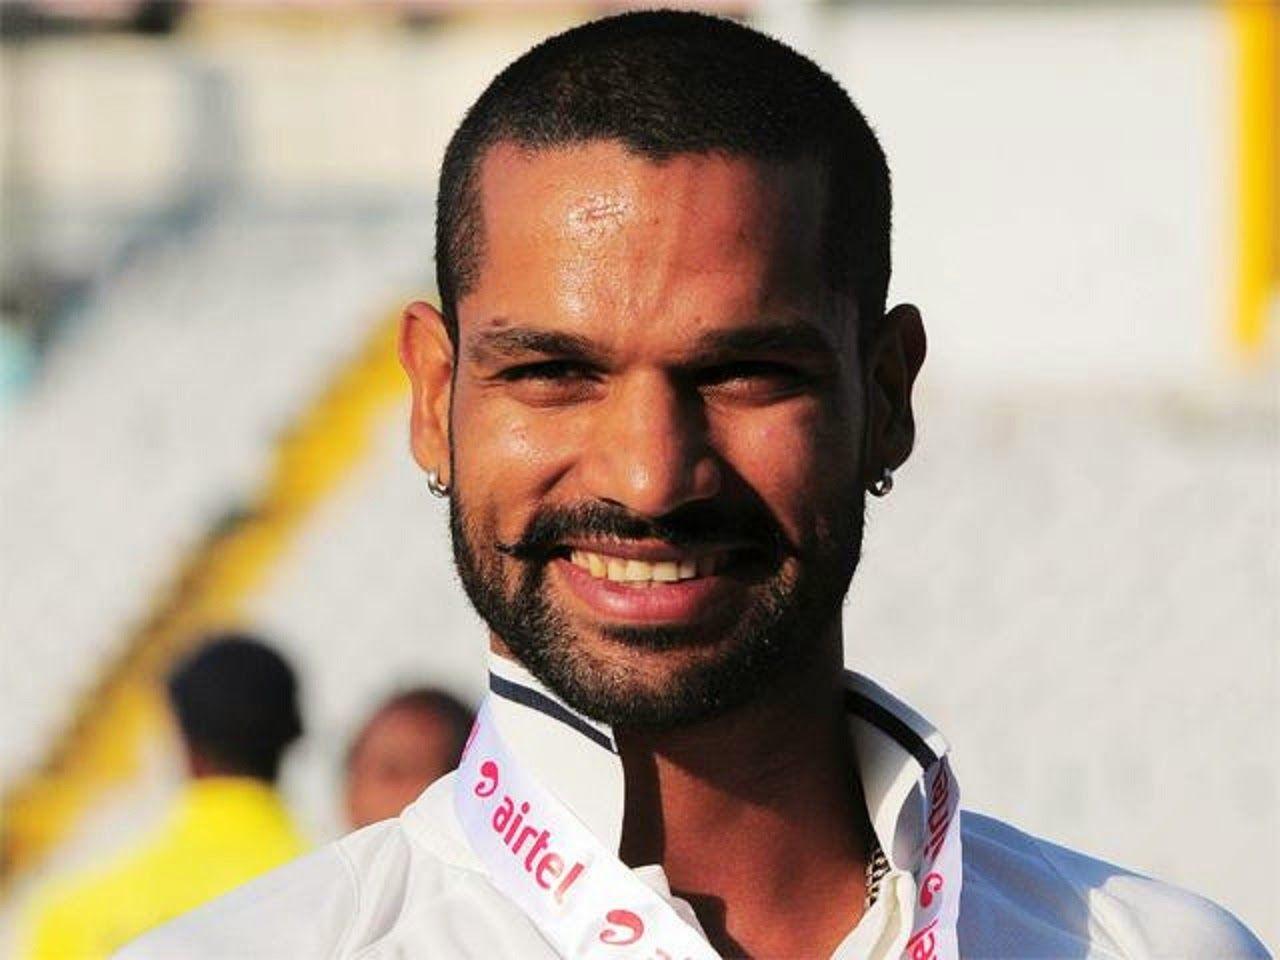 Pin By Bhumika Juyal On Mobile Wallpapers Shikhar Dhawan Latest Sports News Cricket